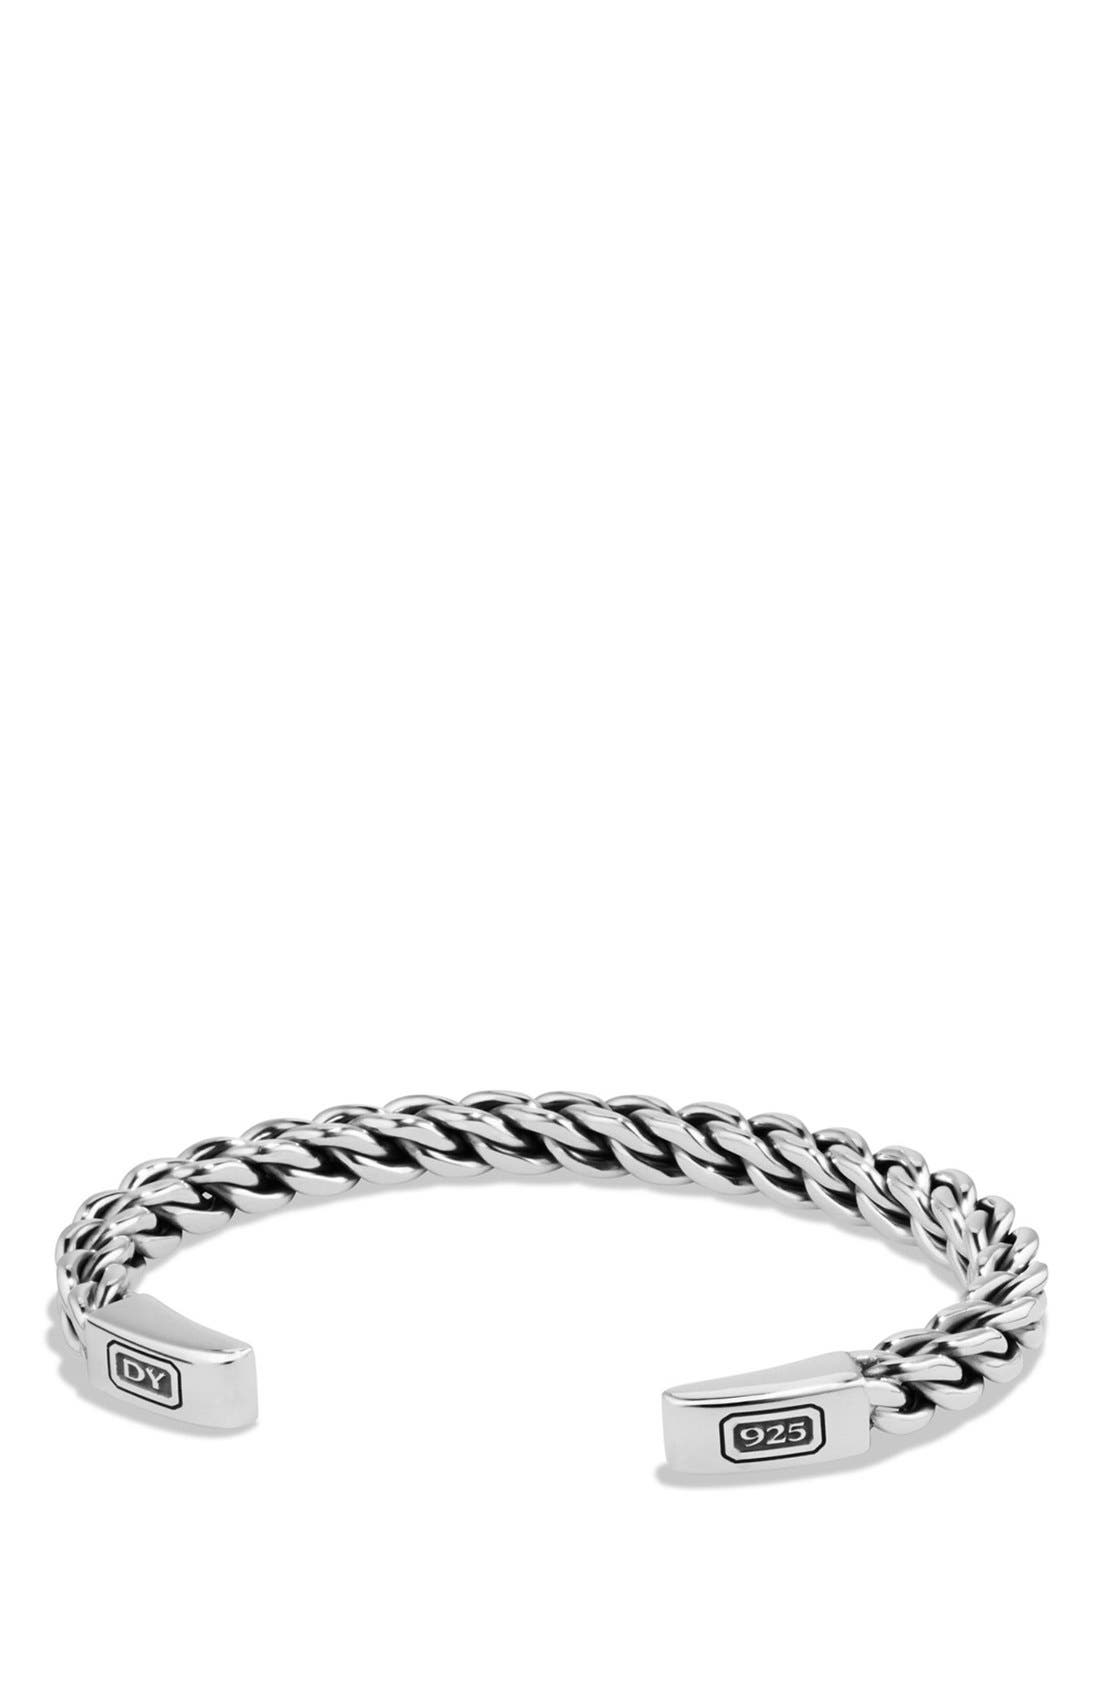 'Chain' Woven Cuff Bracelet,                             Main thumbnail 1, color,                             040